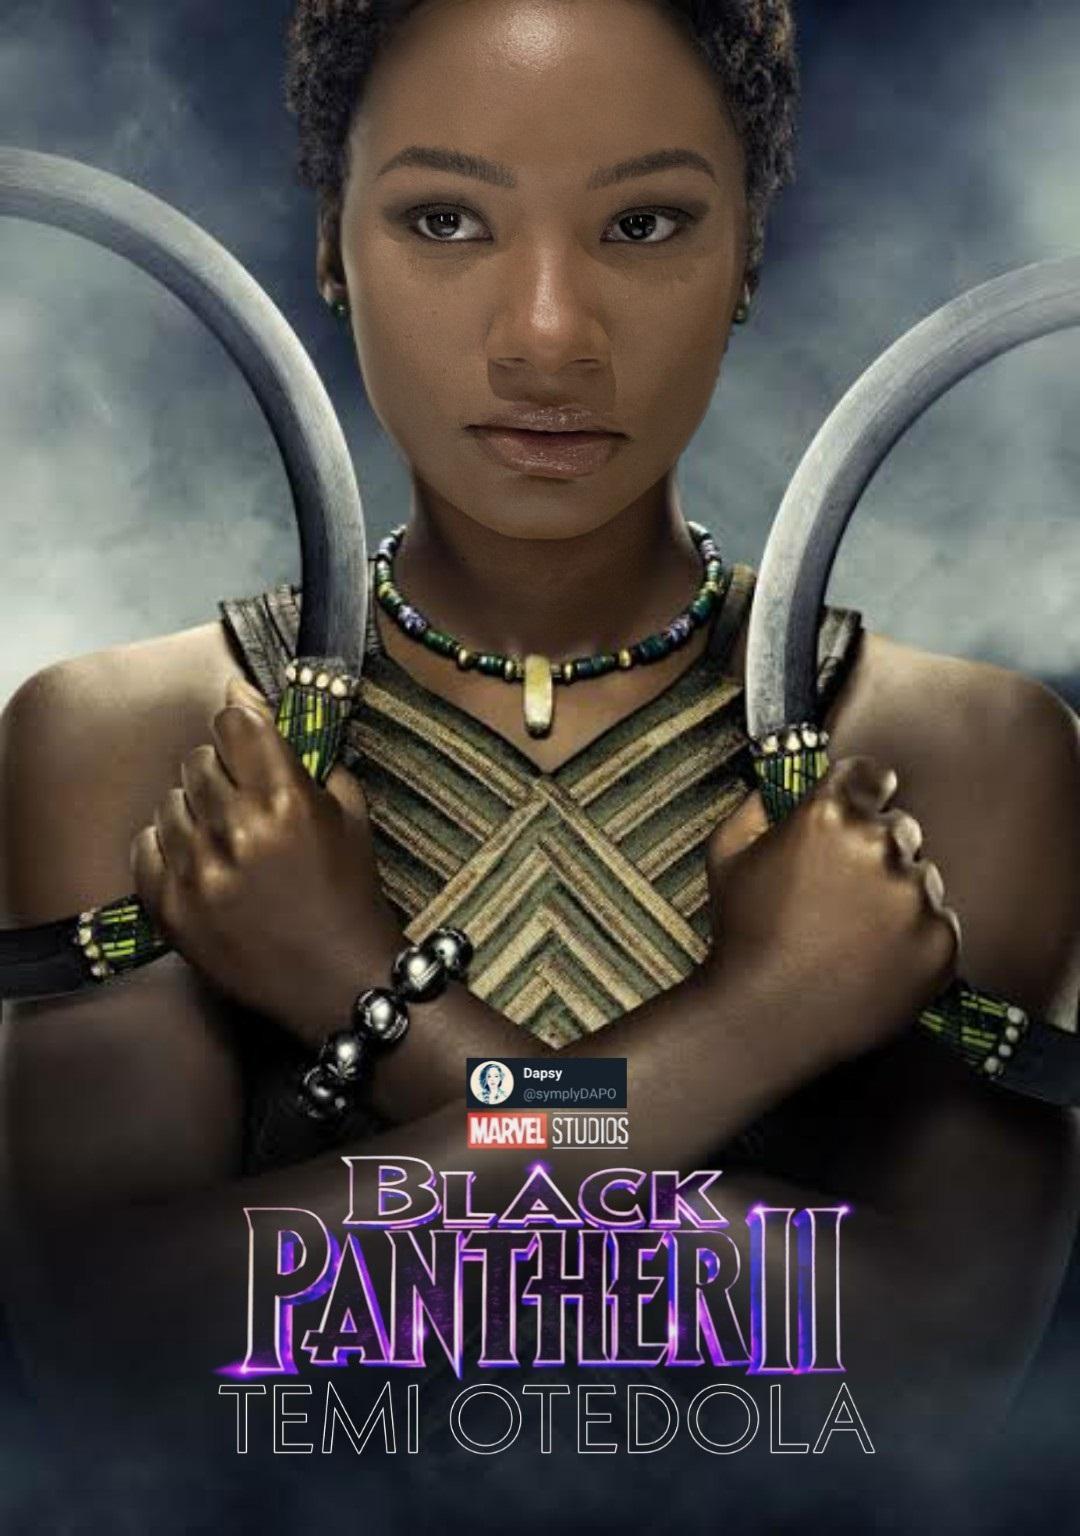 Temi otedola black panther 2 cover